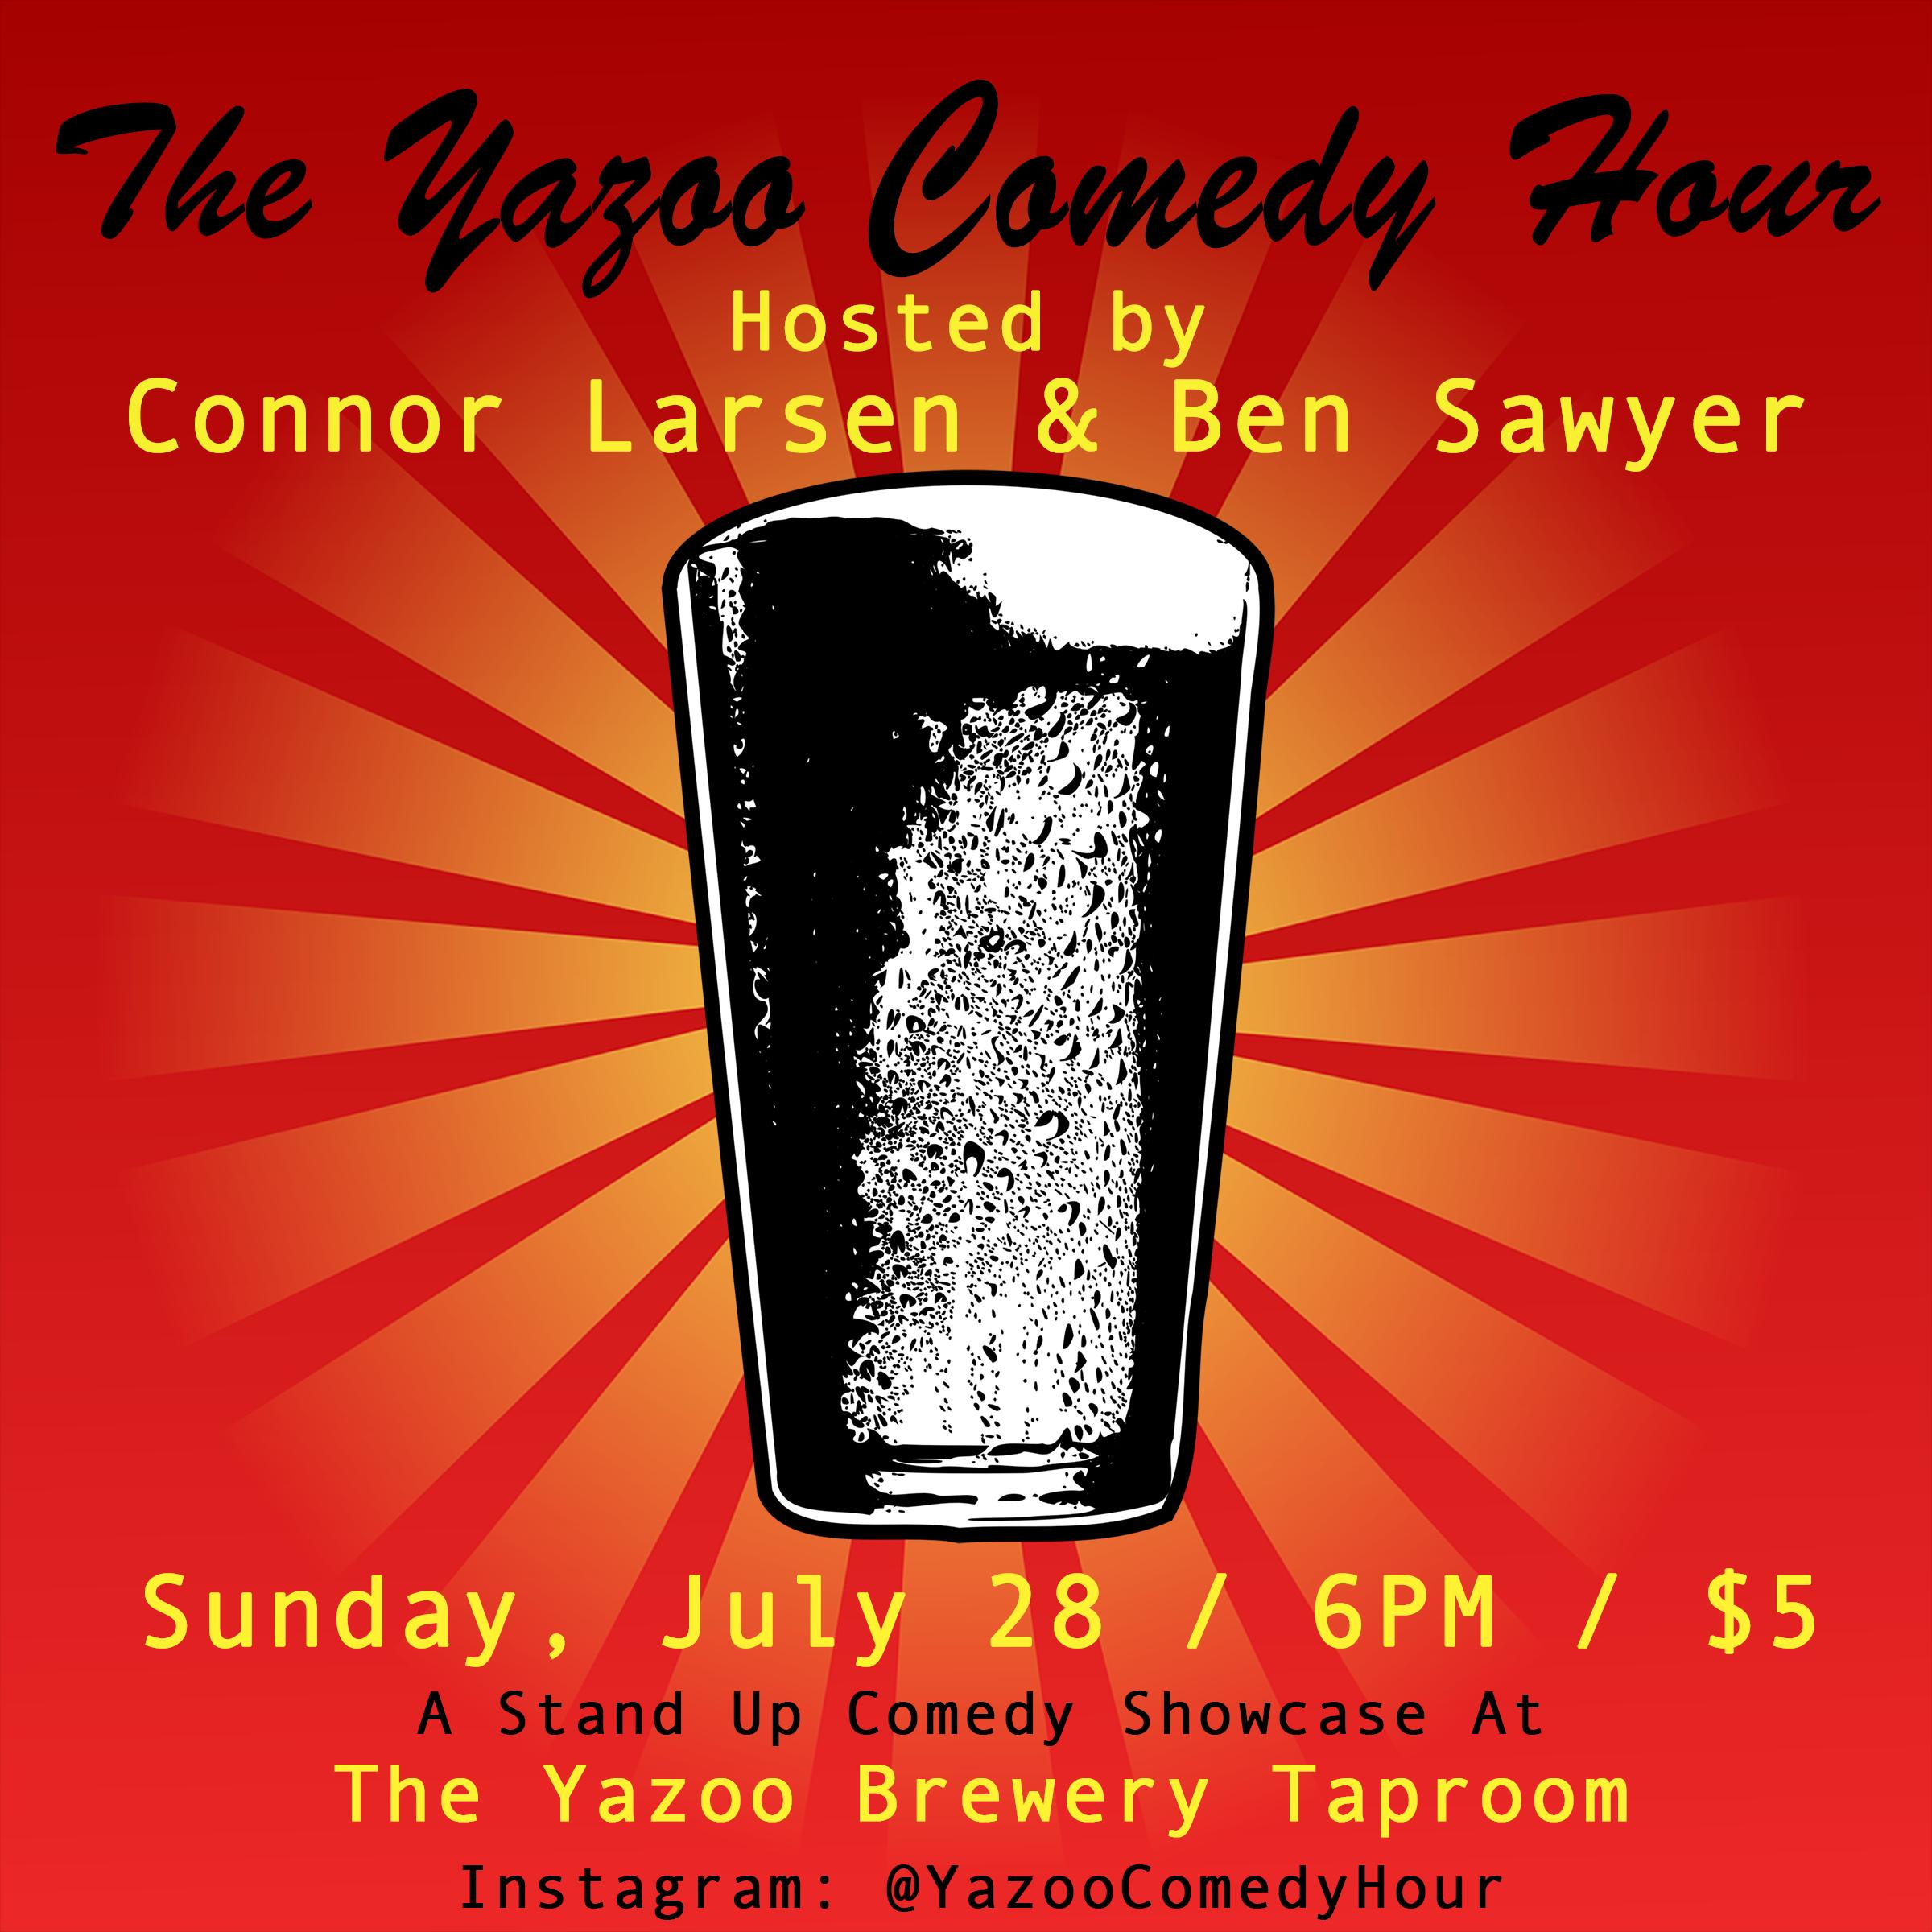 Yazoo Comedy Hour Flyer July 28 2019.png